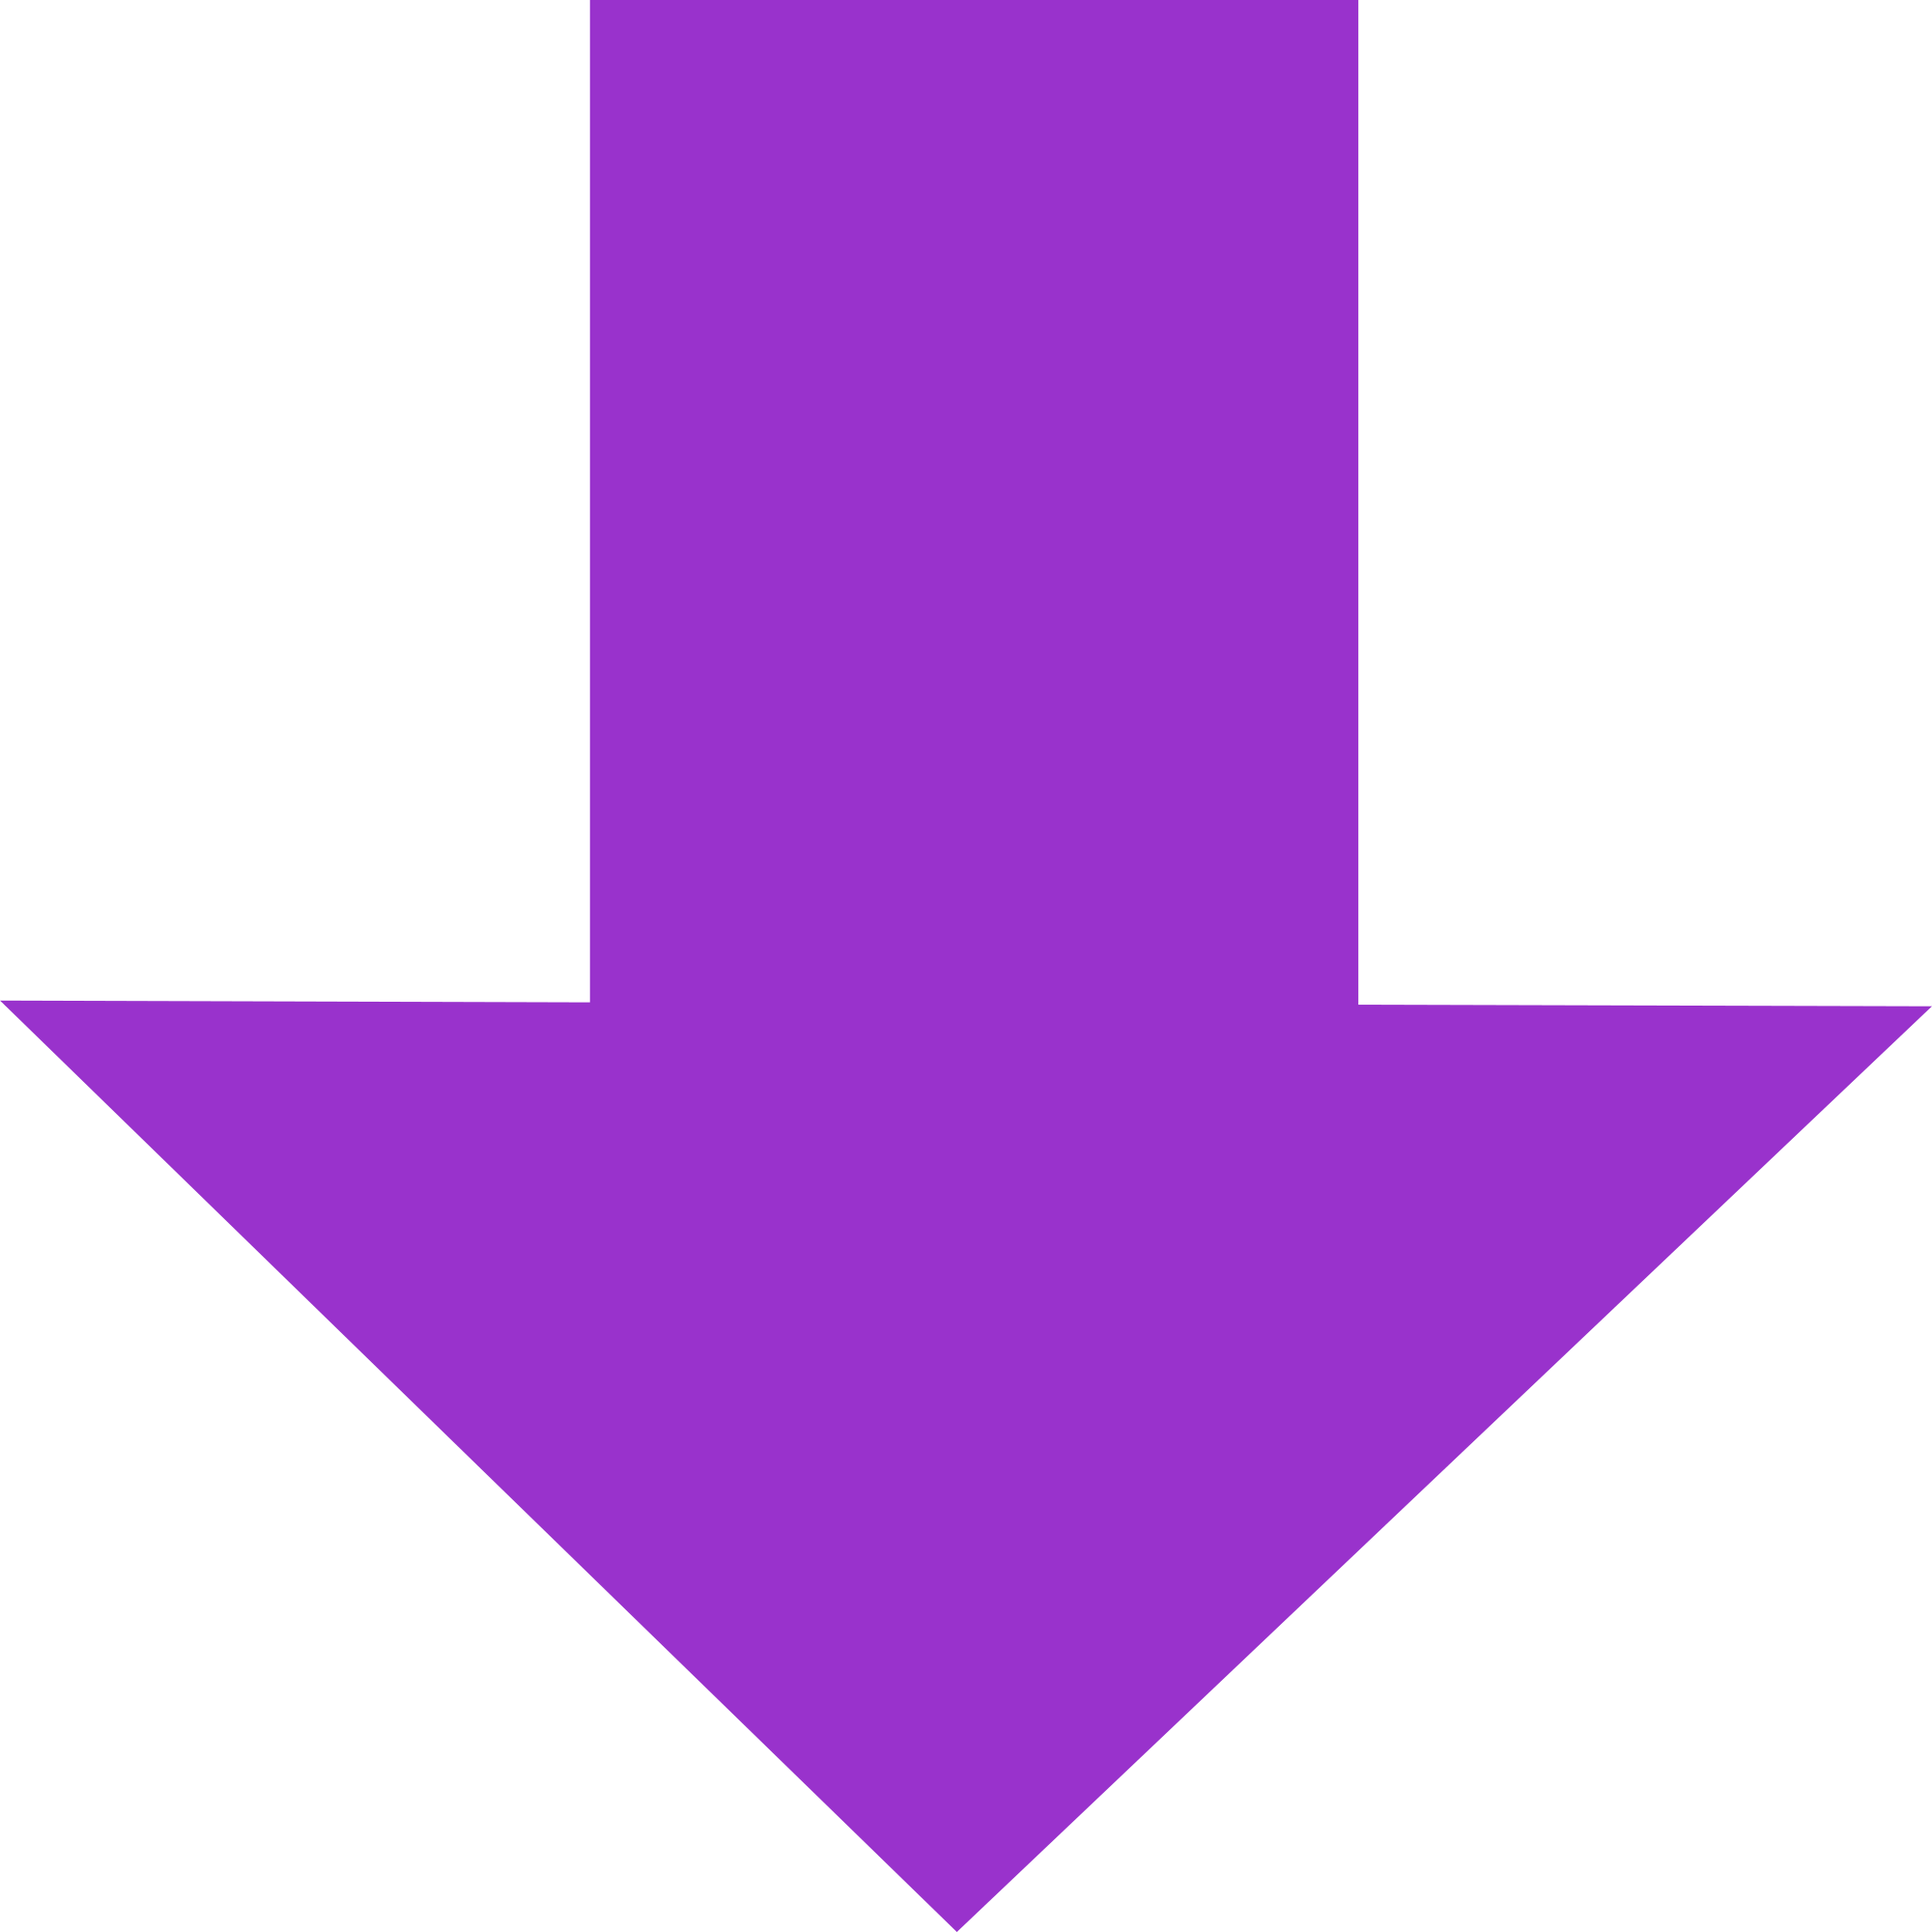 vector transparent download File down svg wikimedia. Purple arrow clipart.